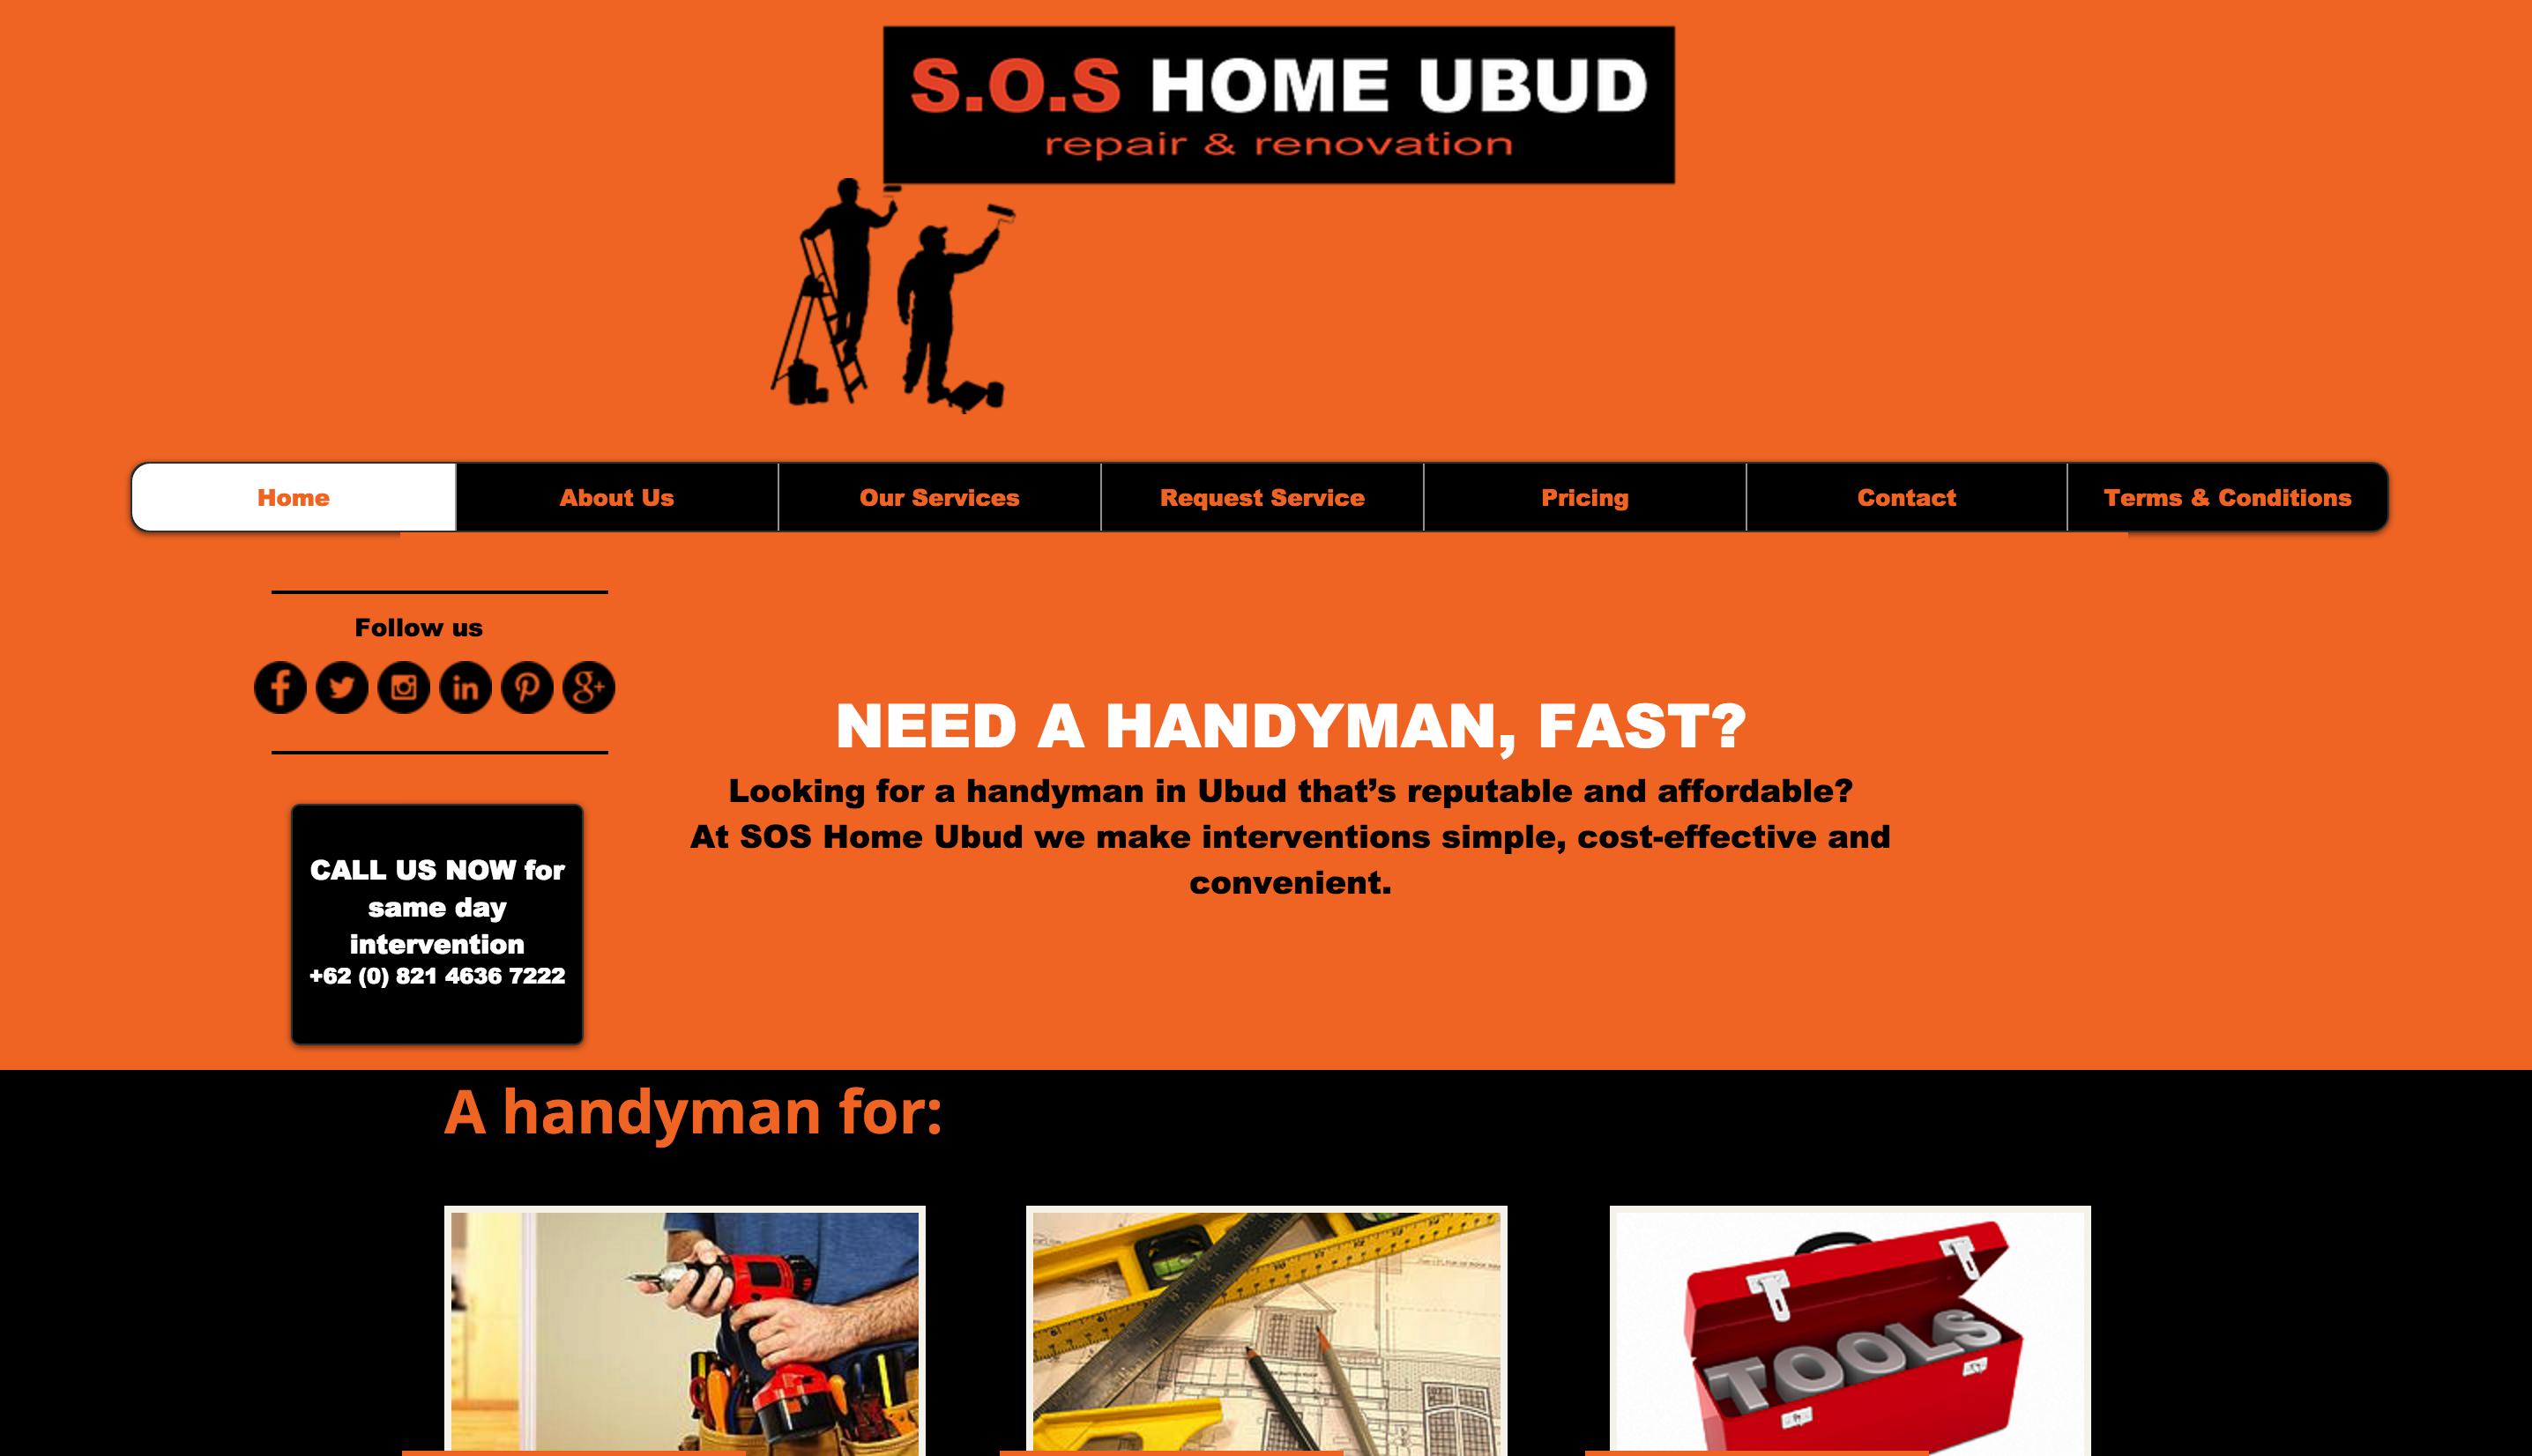 SOS HOME UBUD